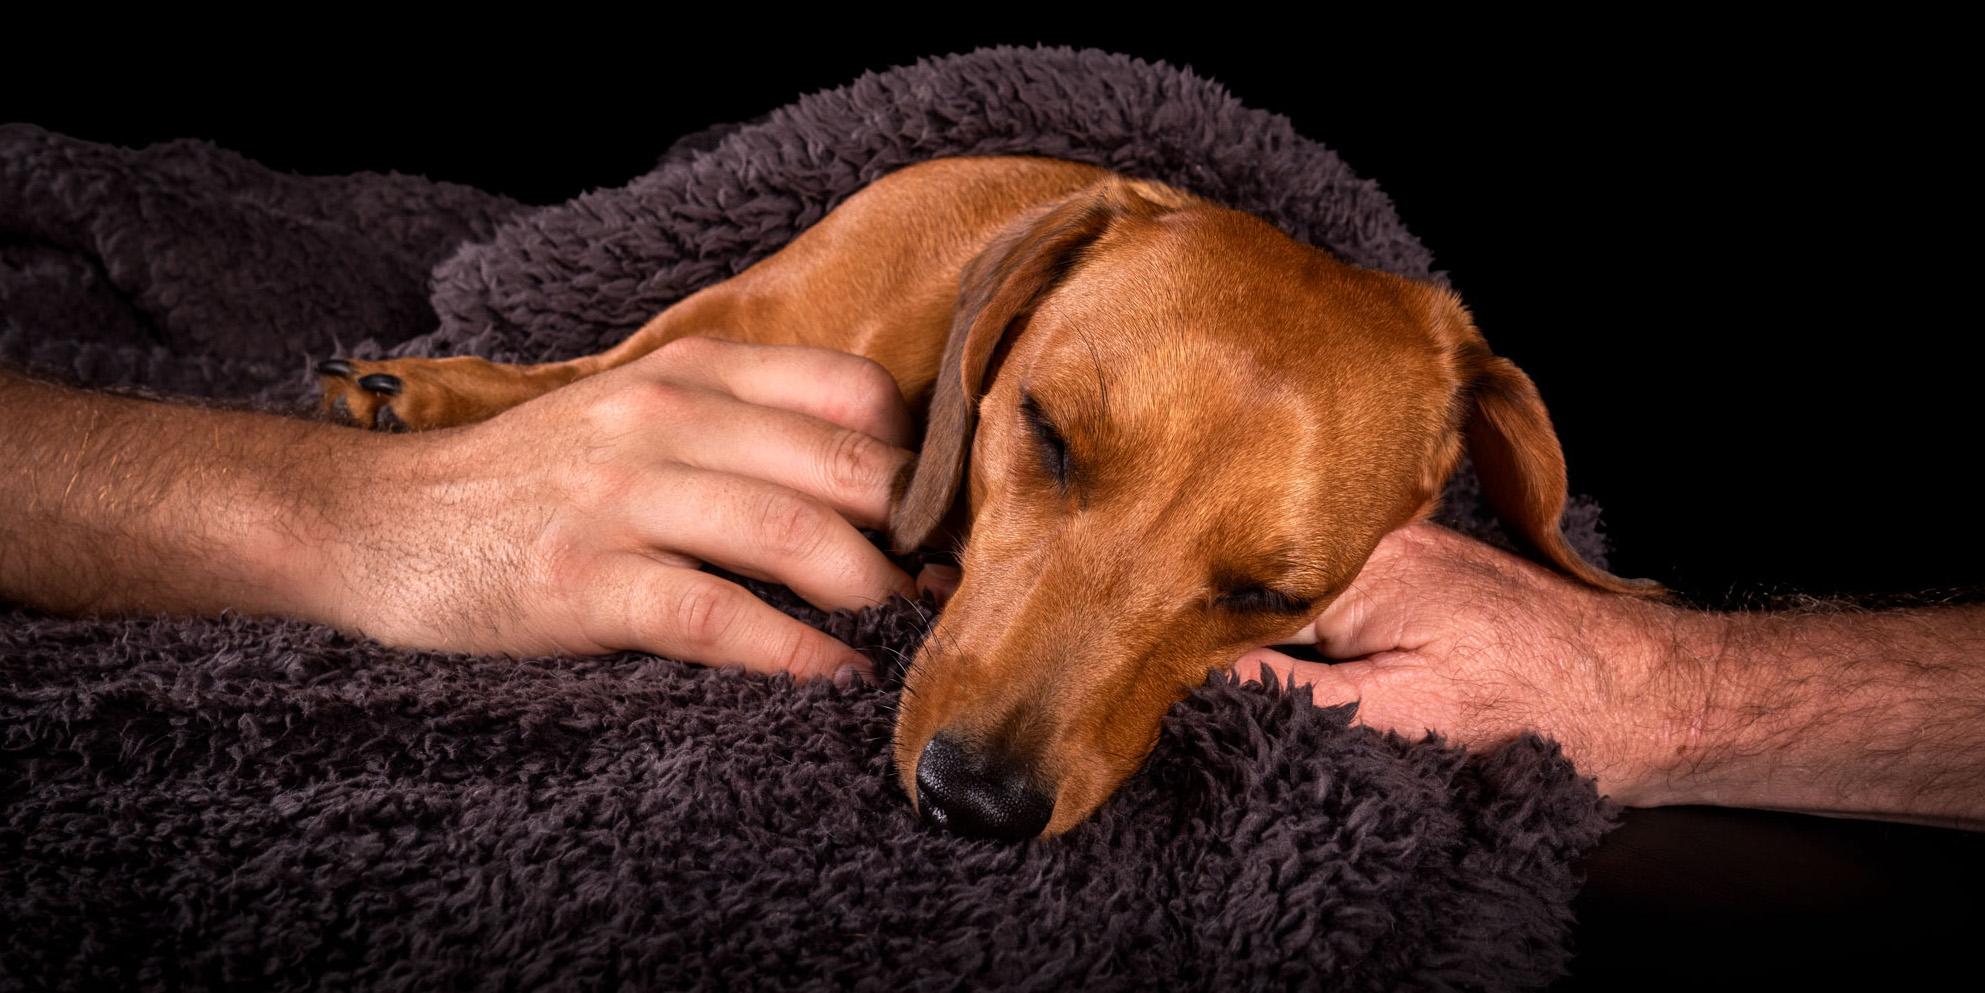 adorable-sausage-dog-sweetheart-sleeping-gorgeous-peaceful-man-hugs